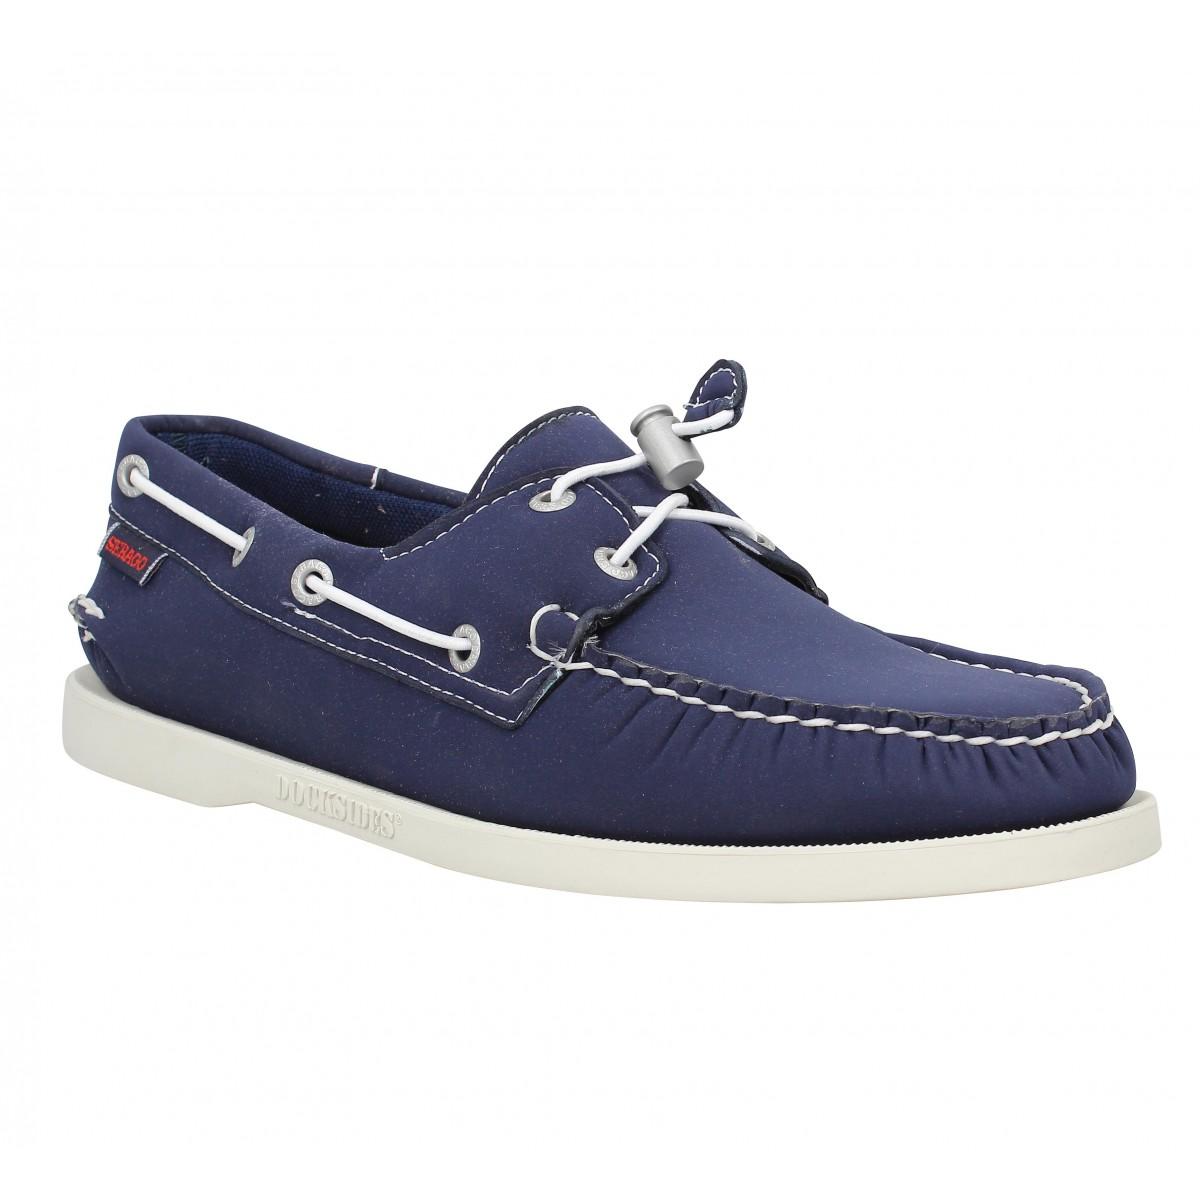 Chaussures bateaux SEBAGO Docksides neoprene Homme Navy